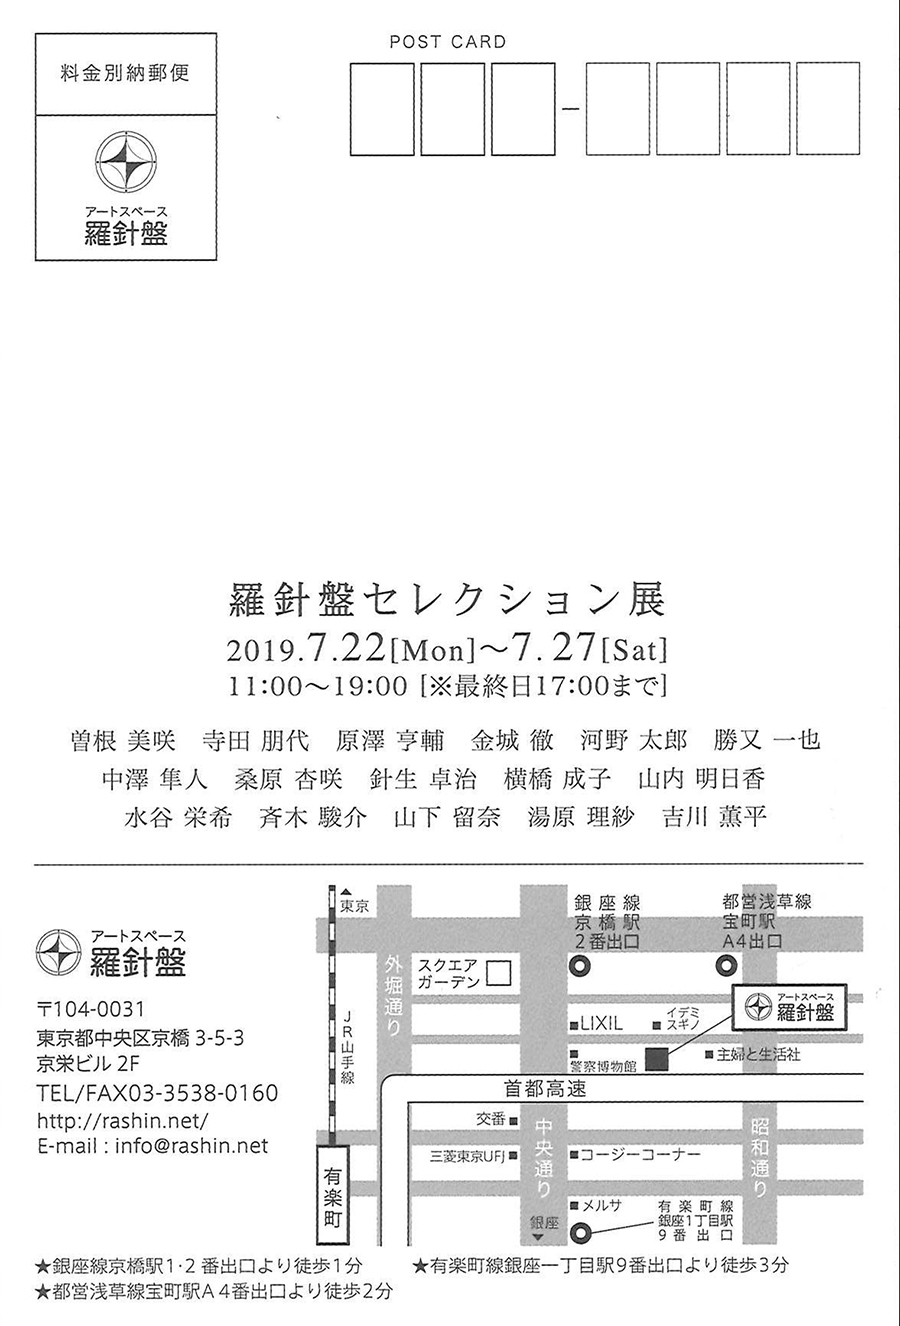 20190717142021_002